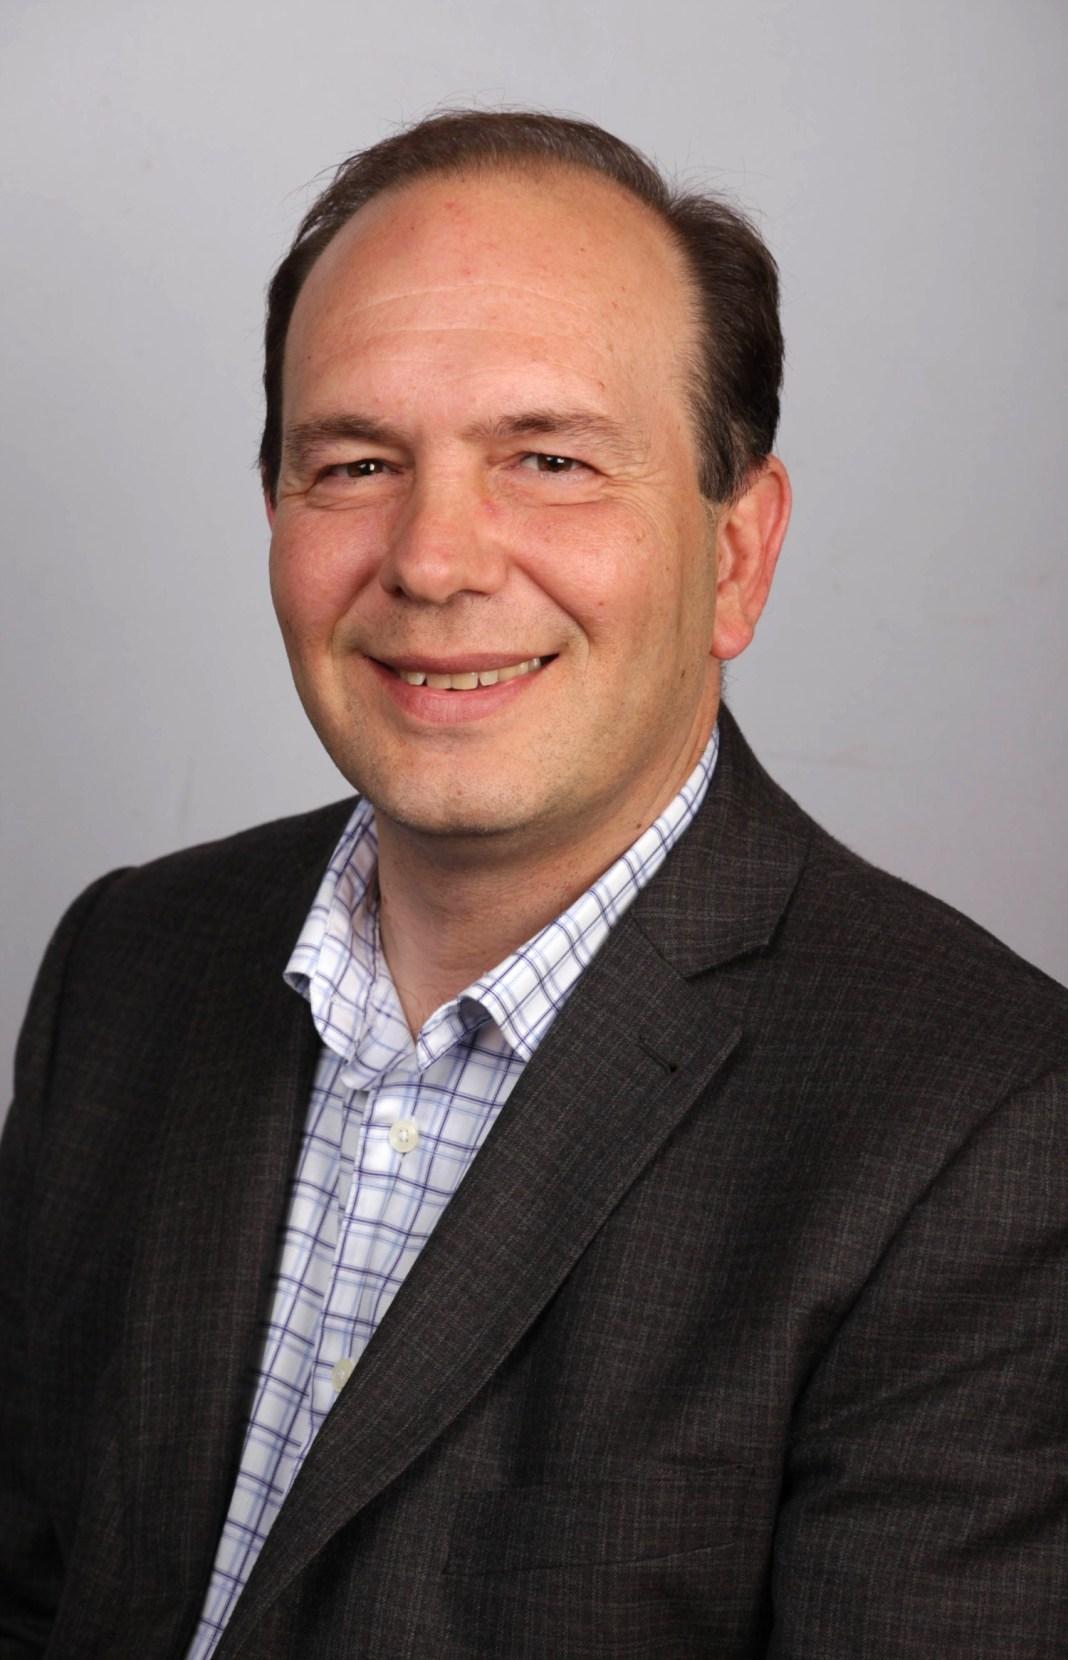 Paul Leduc, President, Globe POS Systems.